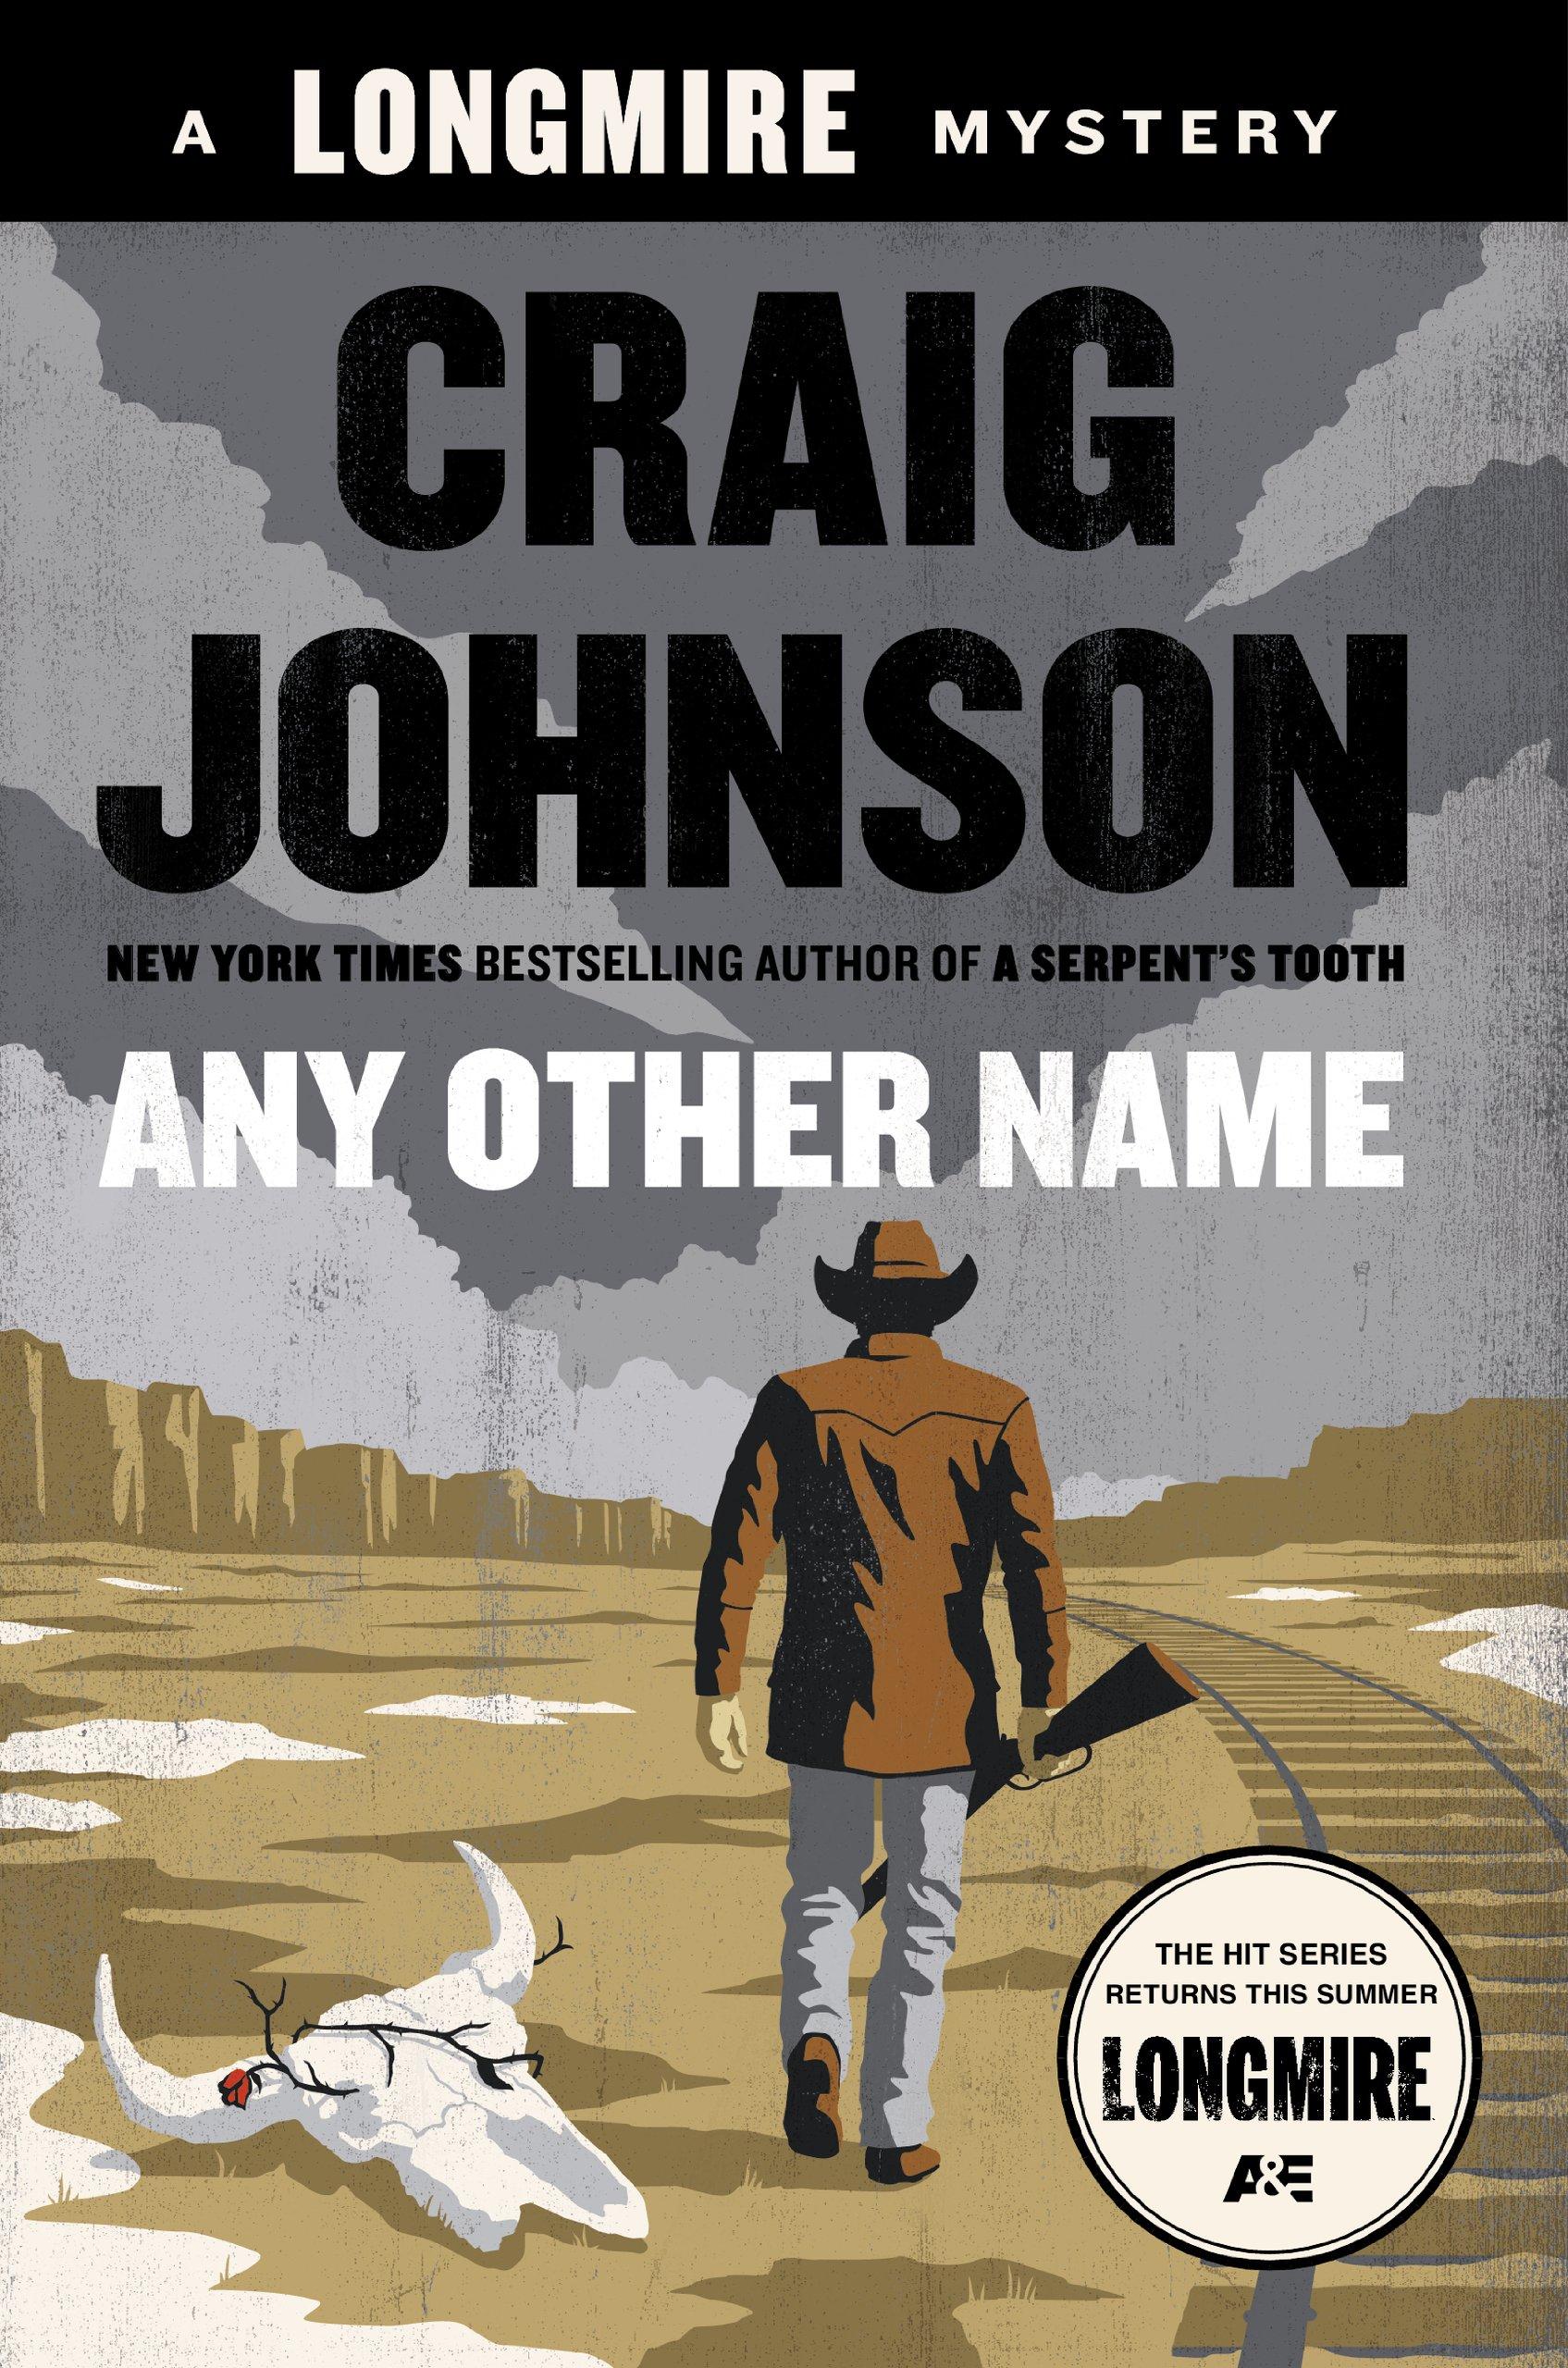 Any Other Name-Craig Johnson-2015 Longmire Mystery-trade sized paperback